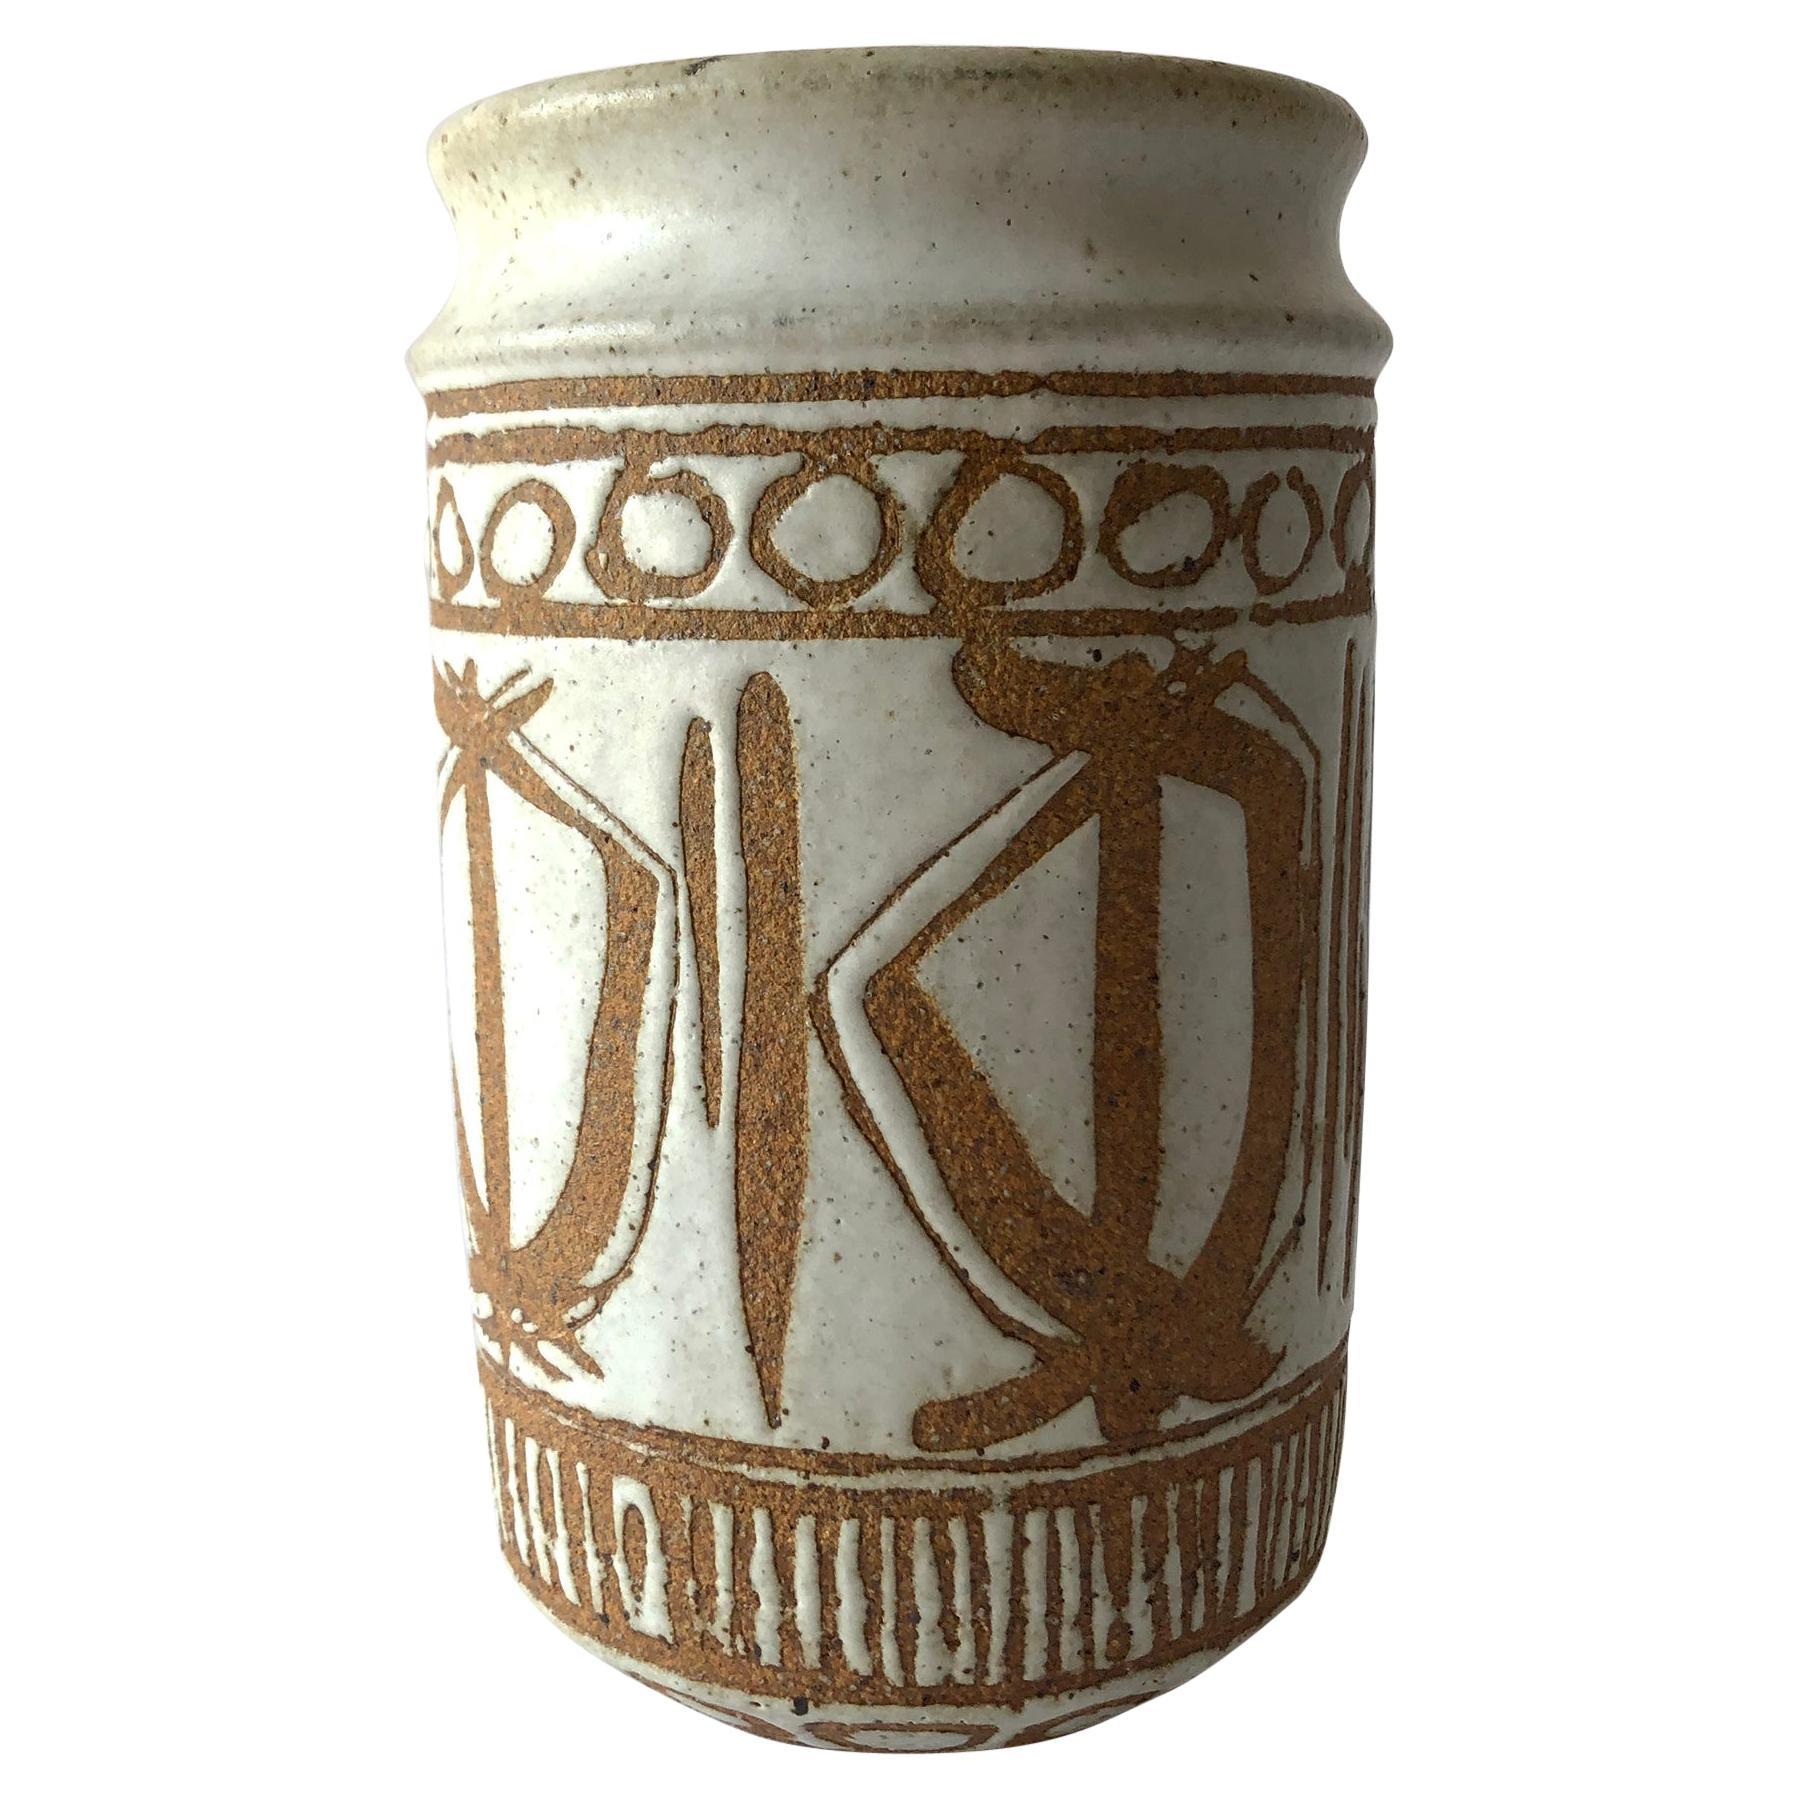 Vic Bracke California Studio Stoneware Pottery Vase with Wax Resist Glazing